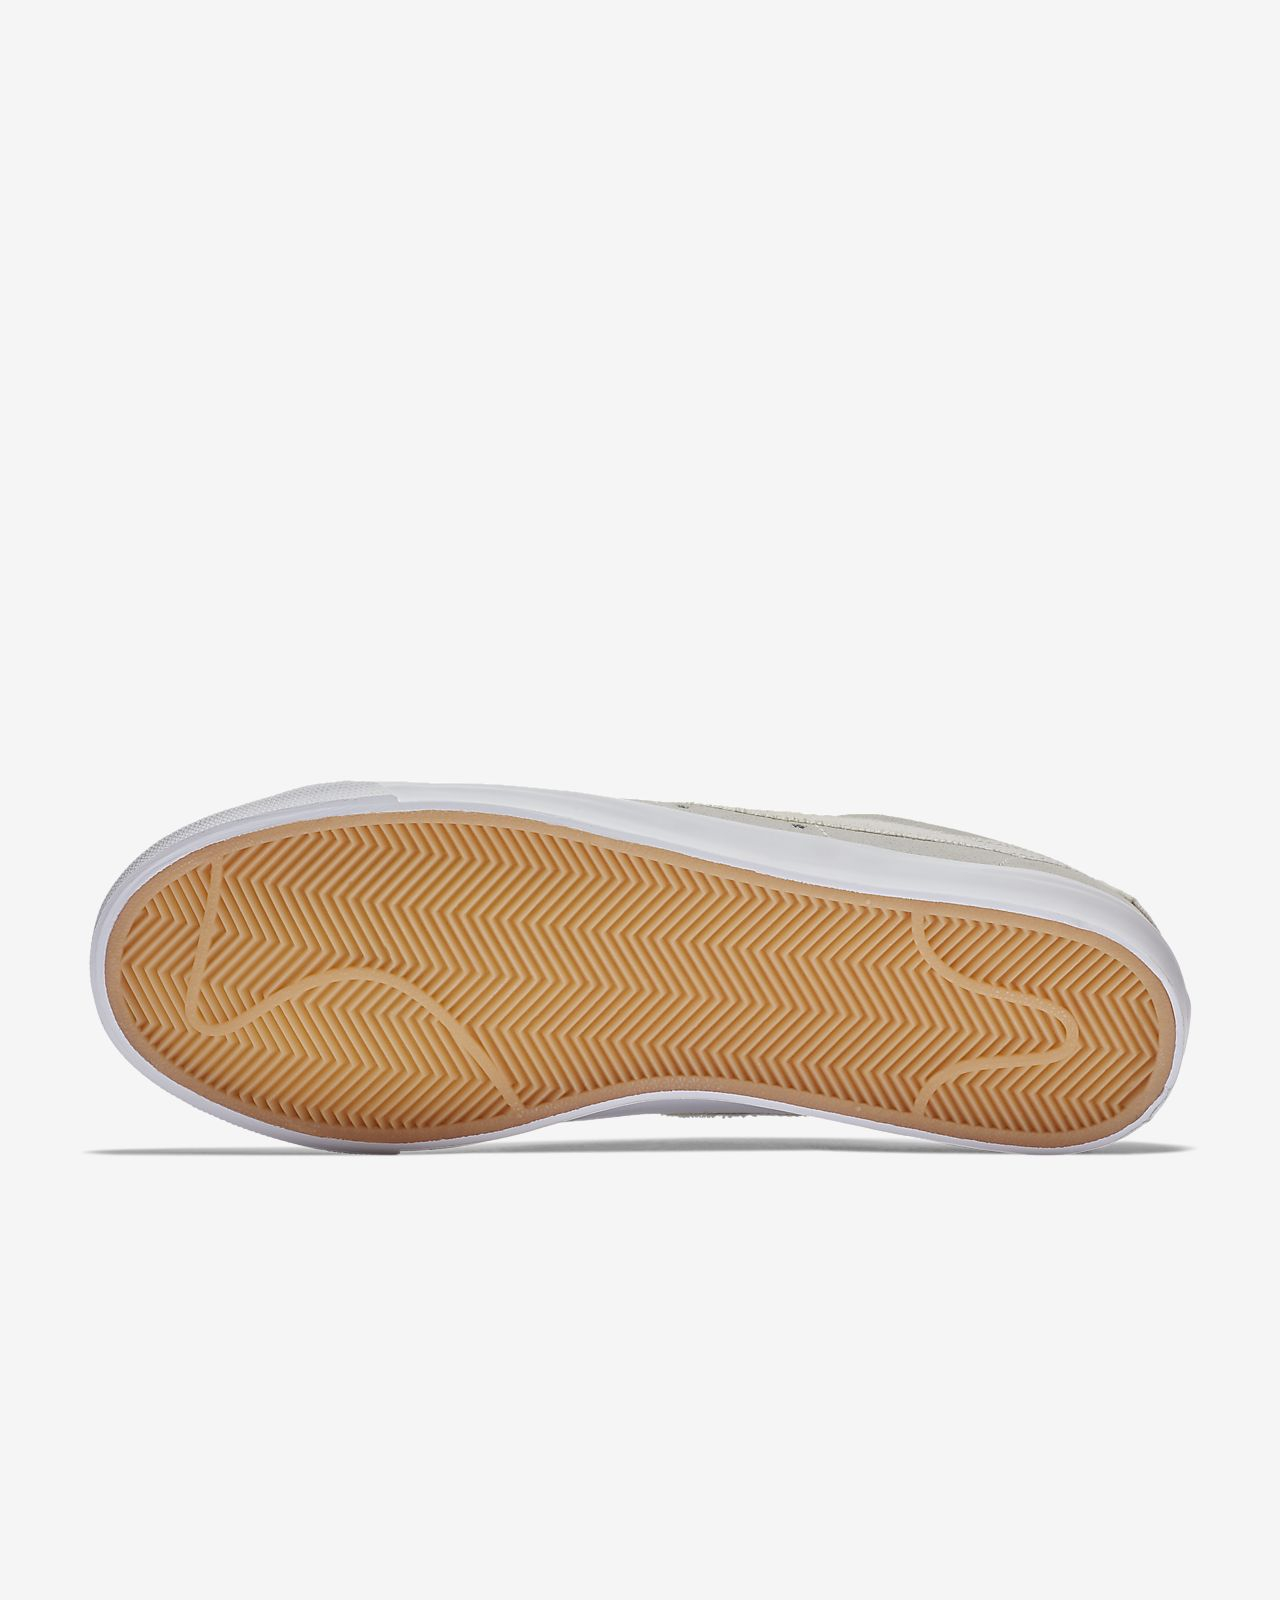 new concept 74cf7 d4b81 ... Nike SB Blazer Low GT Skate Shoe